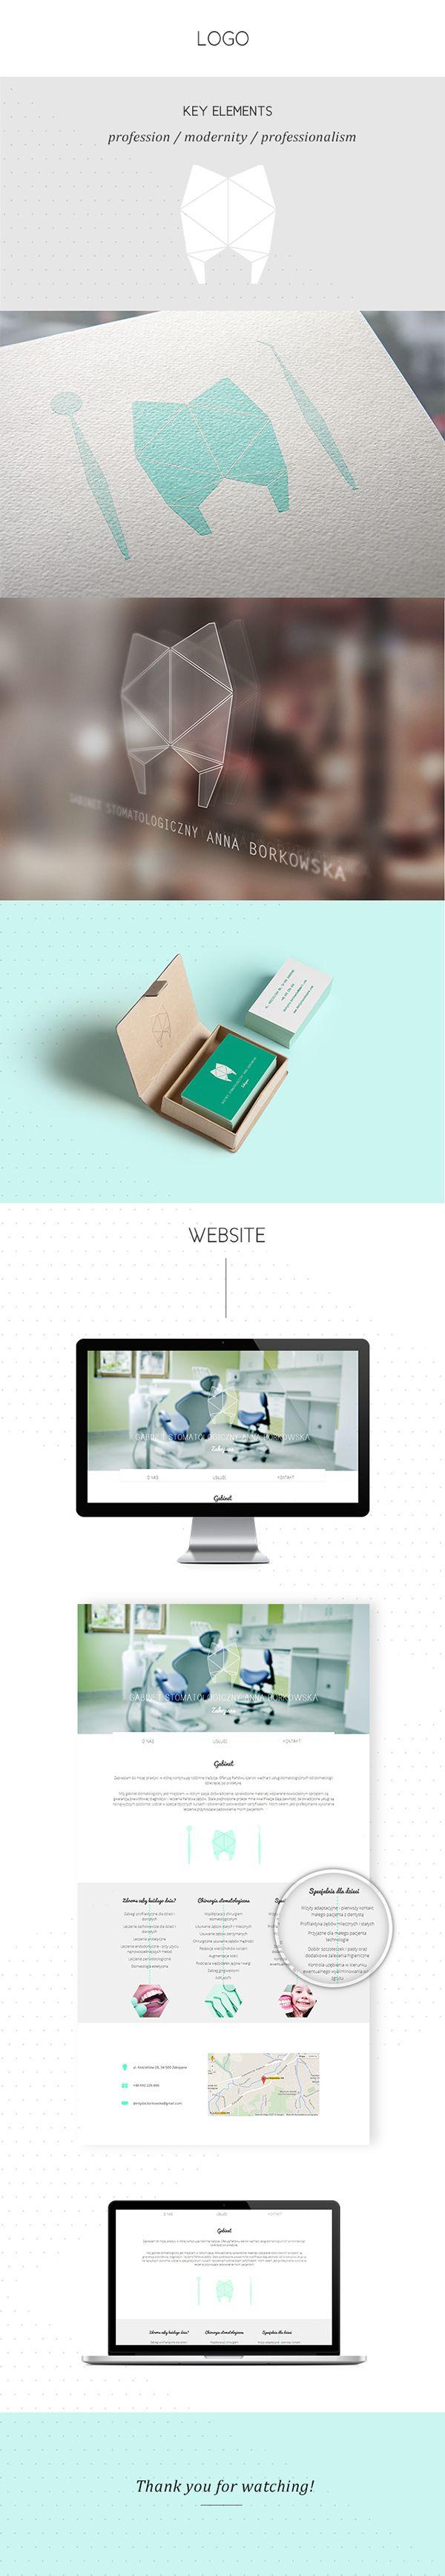 Dentist - Identity & Website Design on Behance More